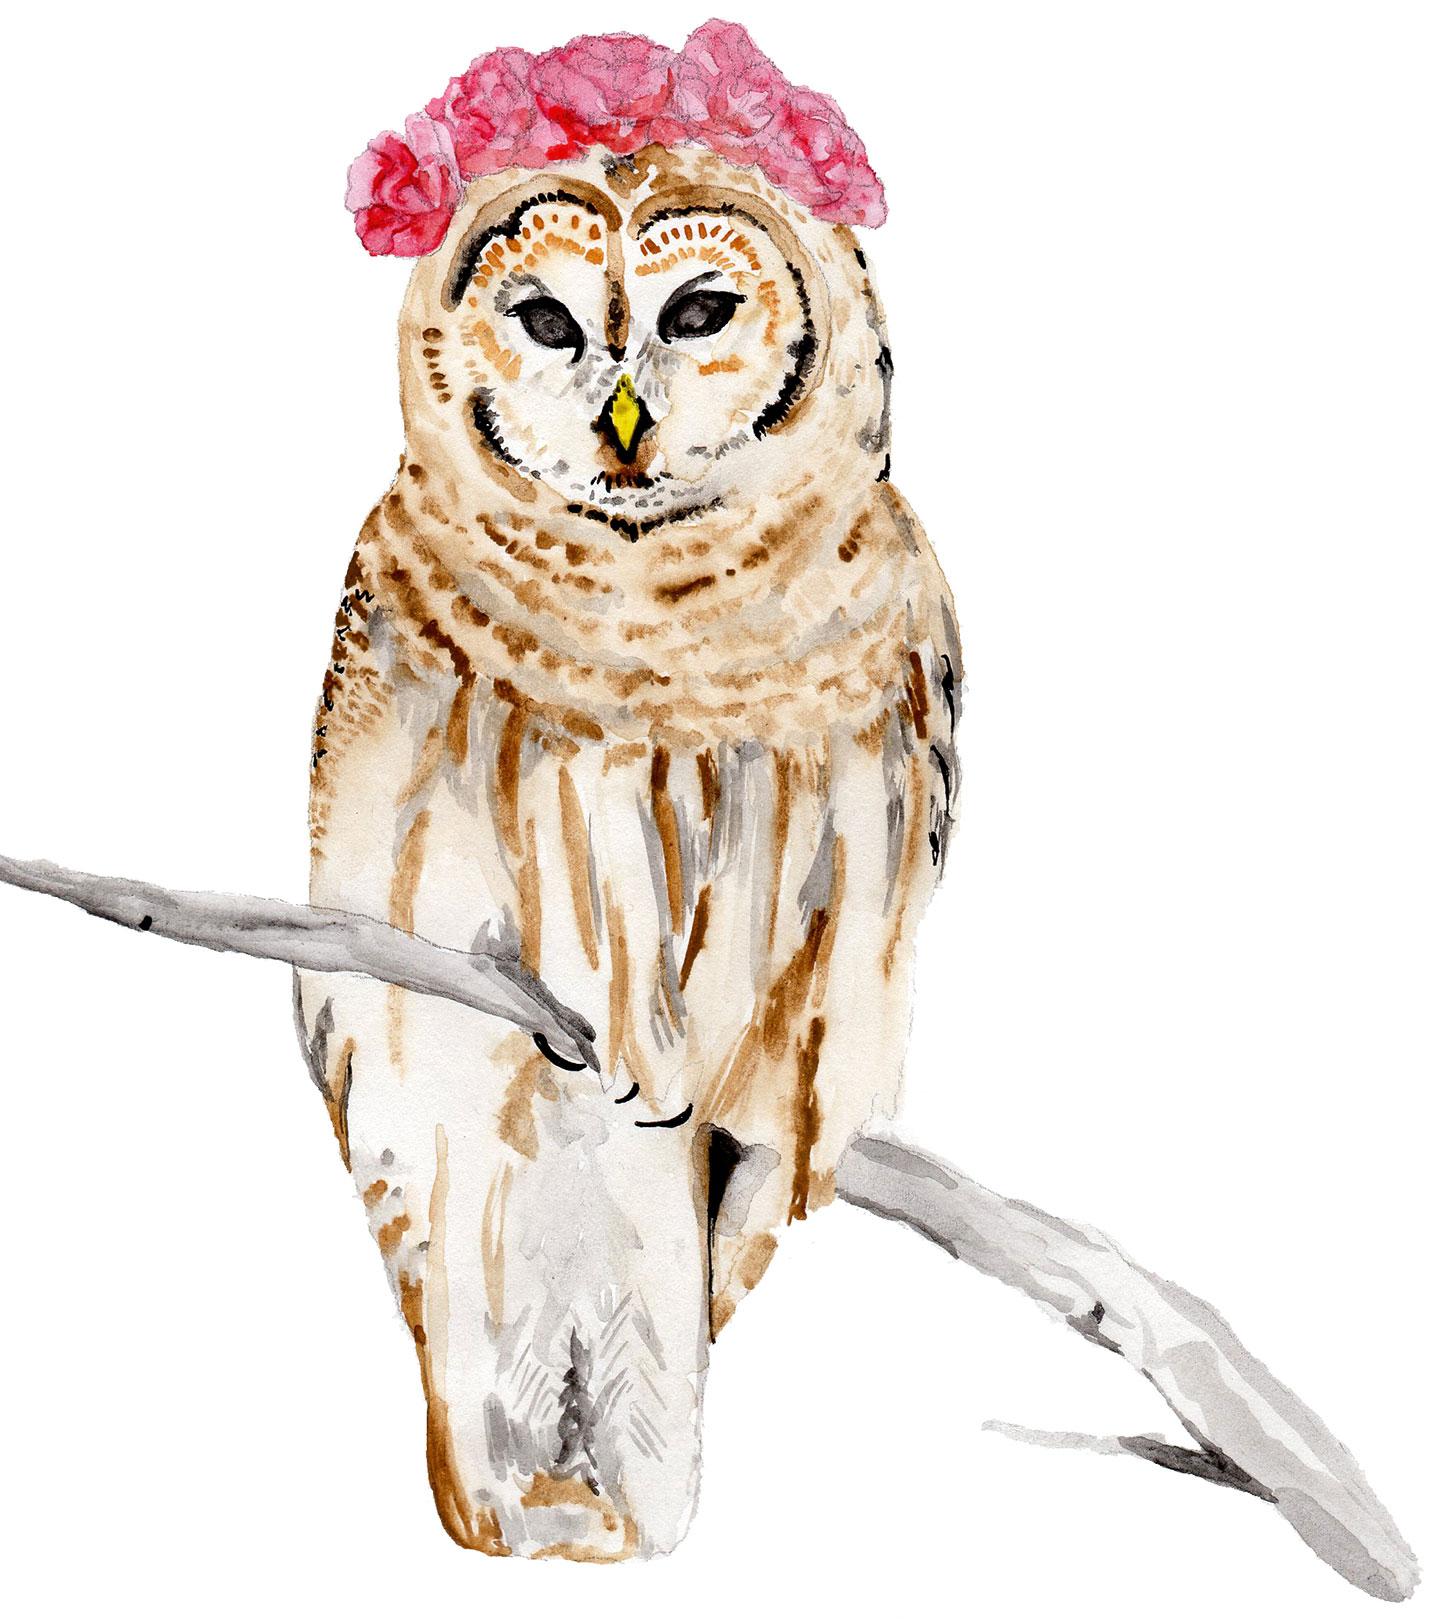 Owl and Peony | The Postman's Knock